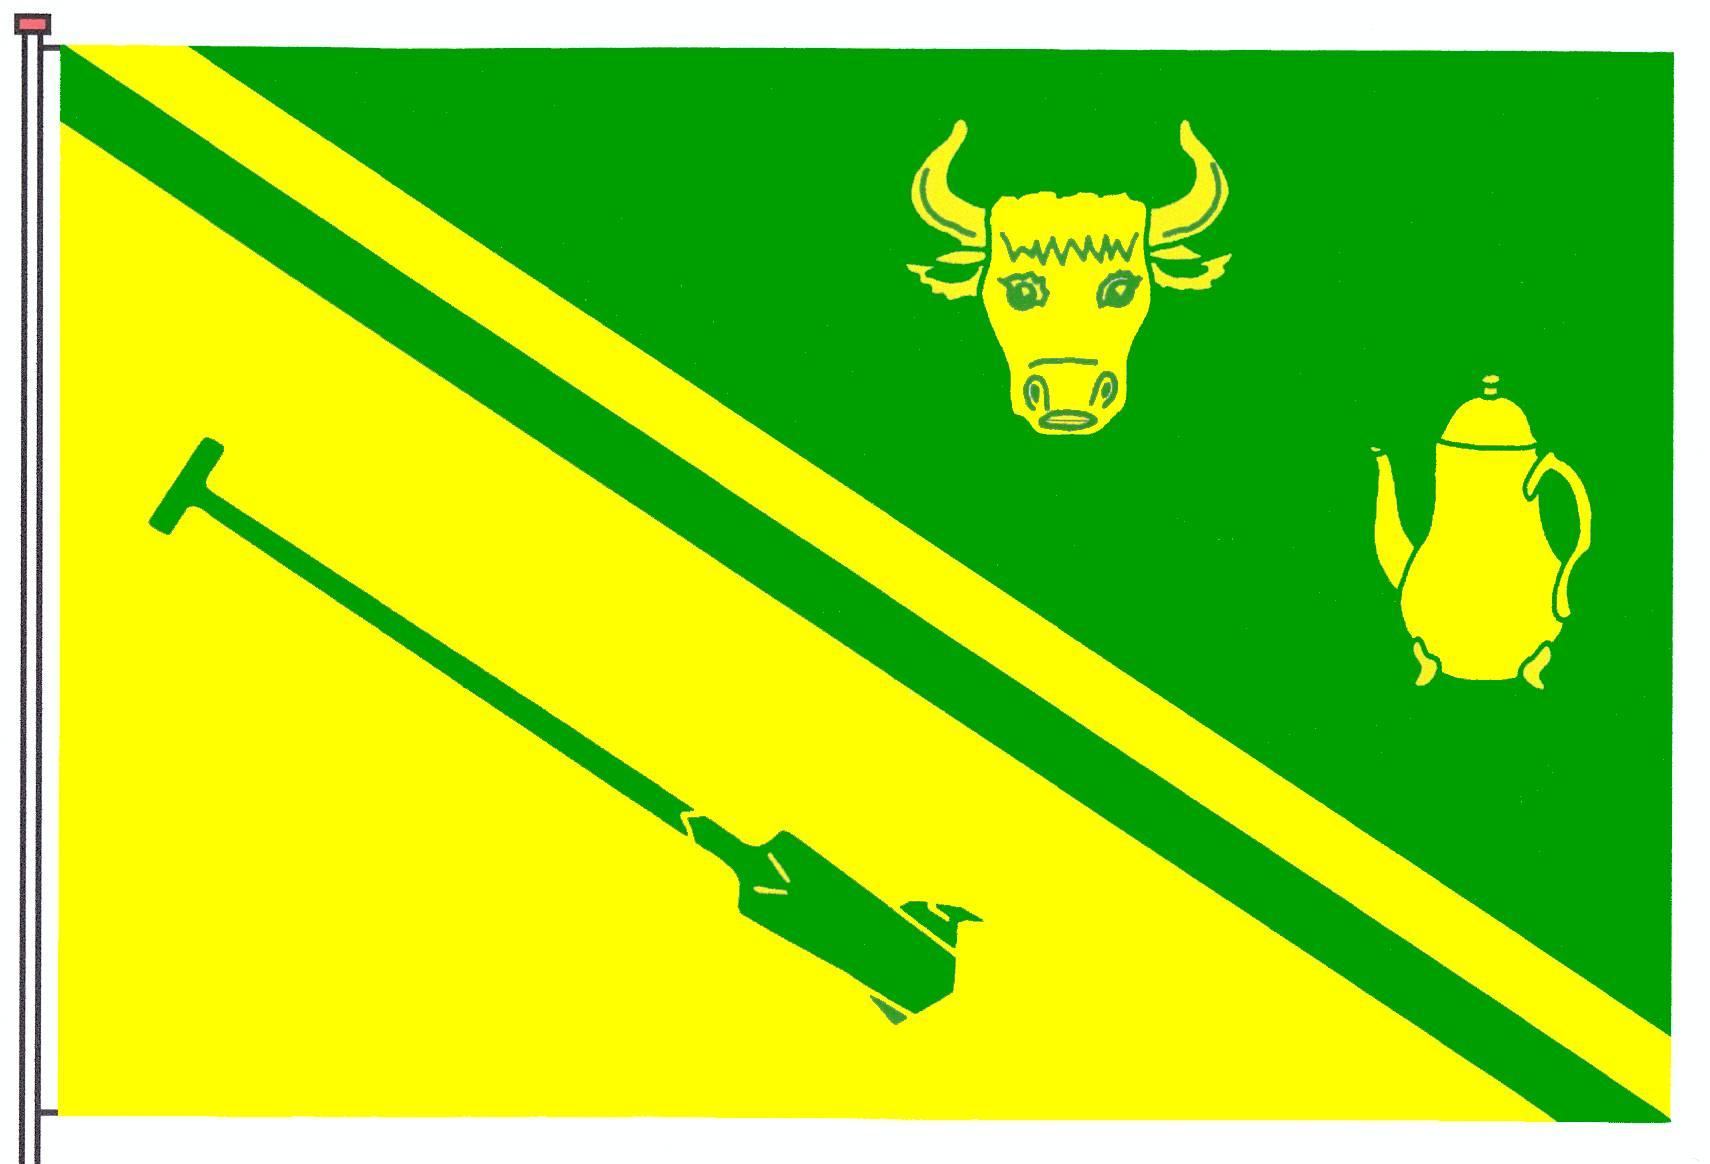 Flagge GemeindeHaselund, Kreis Nordfriesland